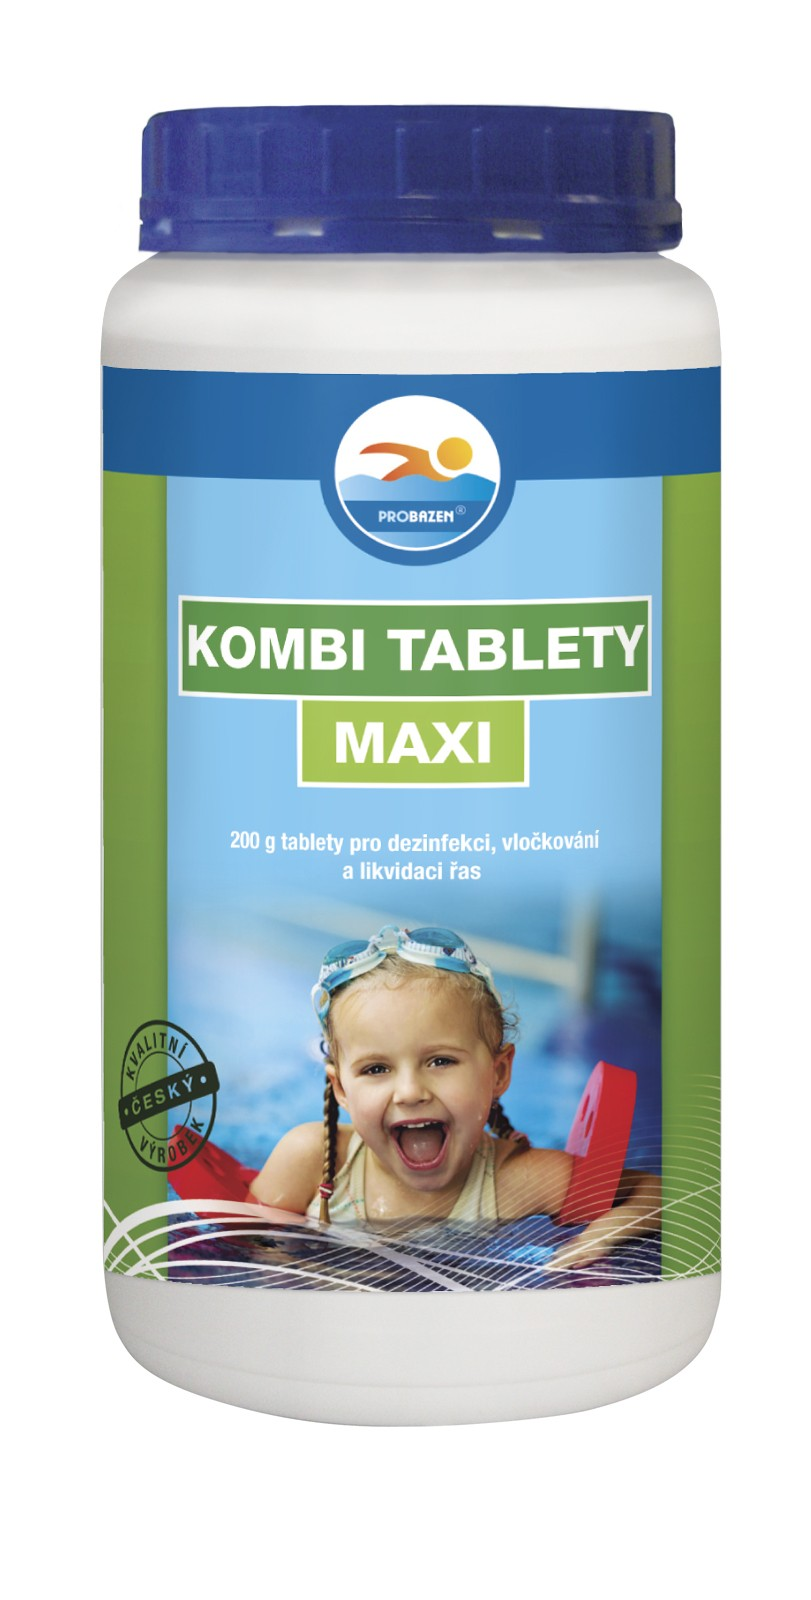 kombi tablety